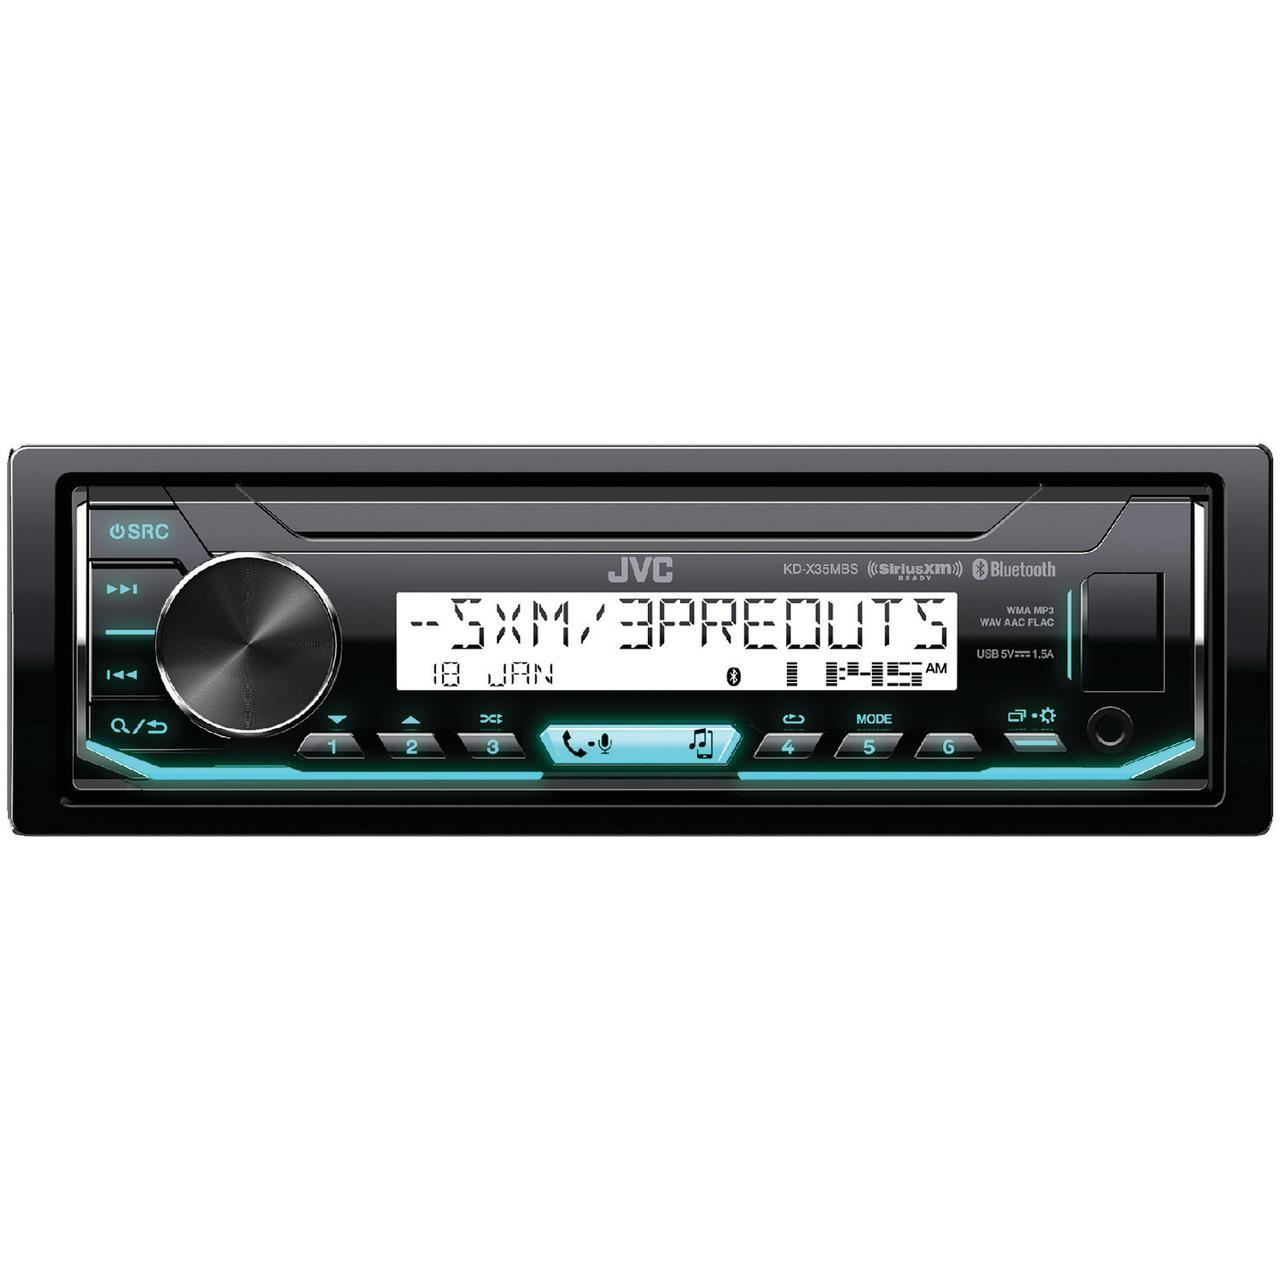 JVC Mobile KD-X35MBS Marine/Motorsports Single-DIN In-Dash AM/FM Digital Media Receiver with Bluetooth & SiriusXM Ready